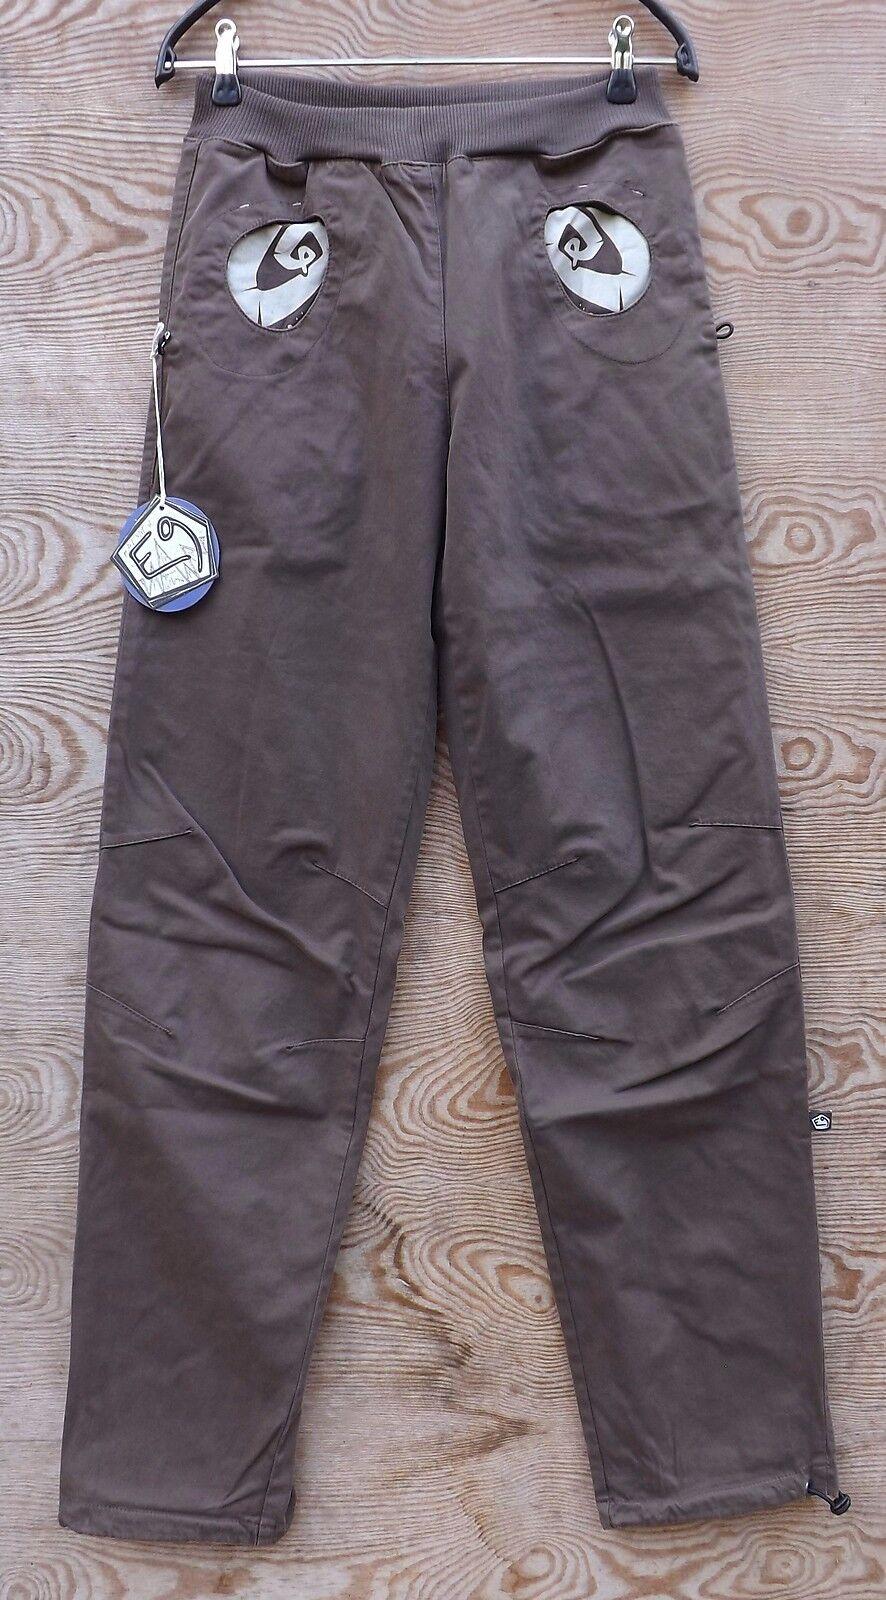 E9 Pulce Pantaloni da Donna, Palude, DonnaArrampicata Boulderhose Gr. S